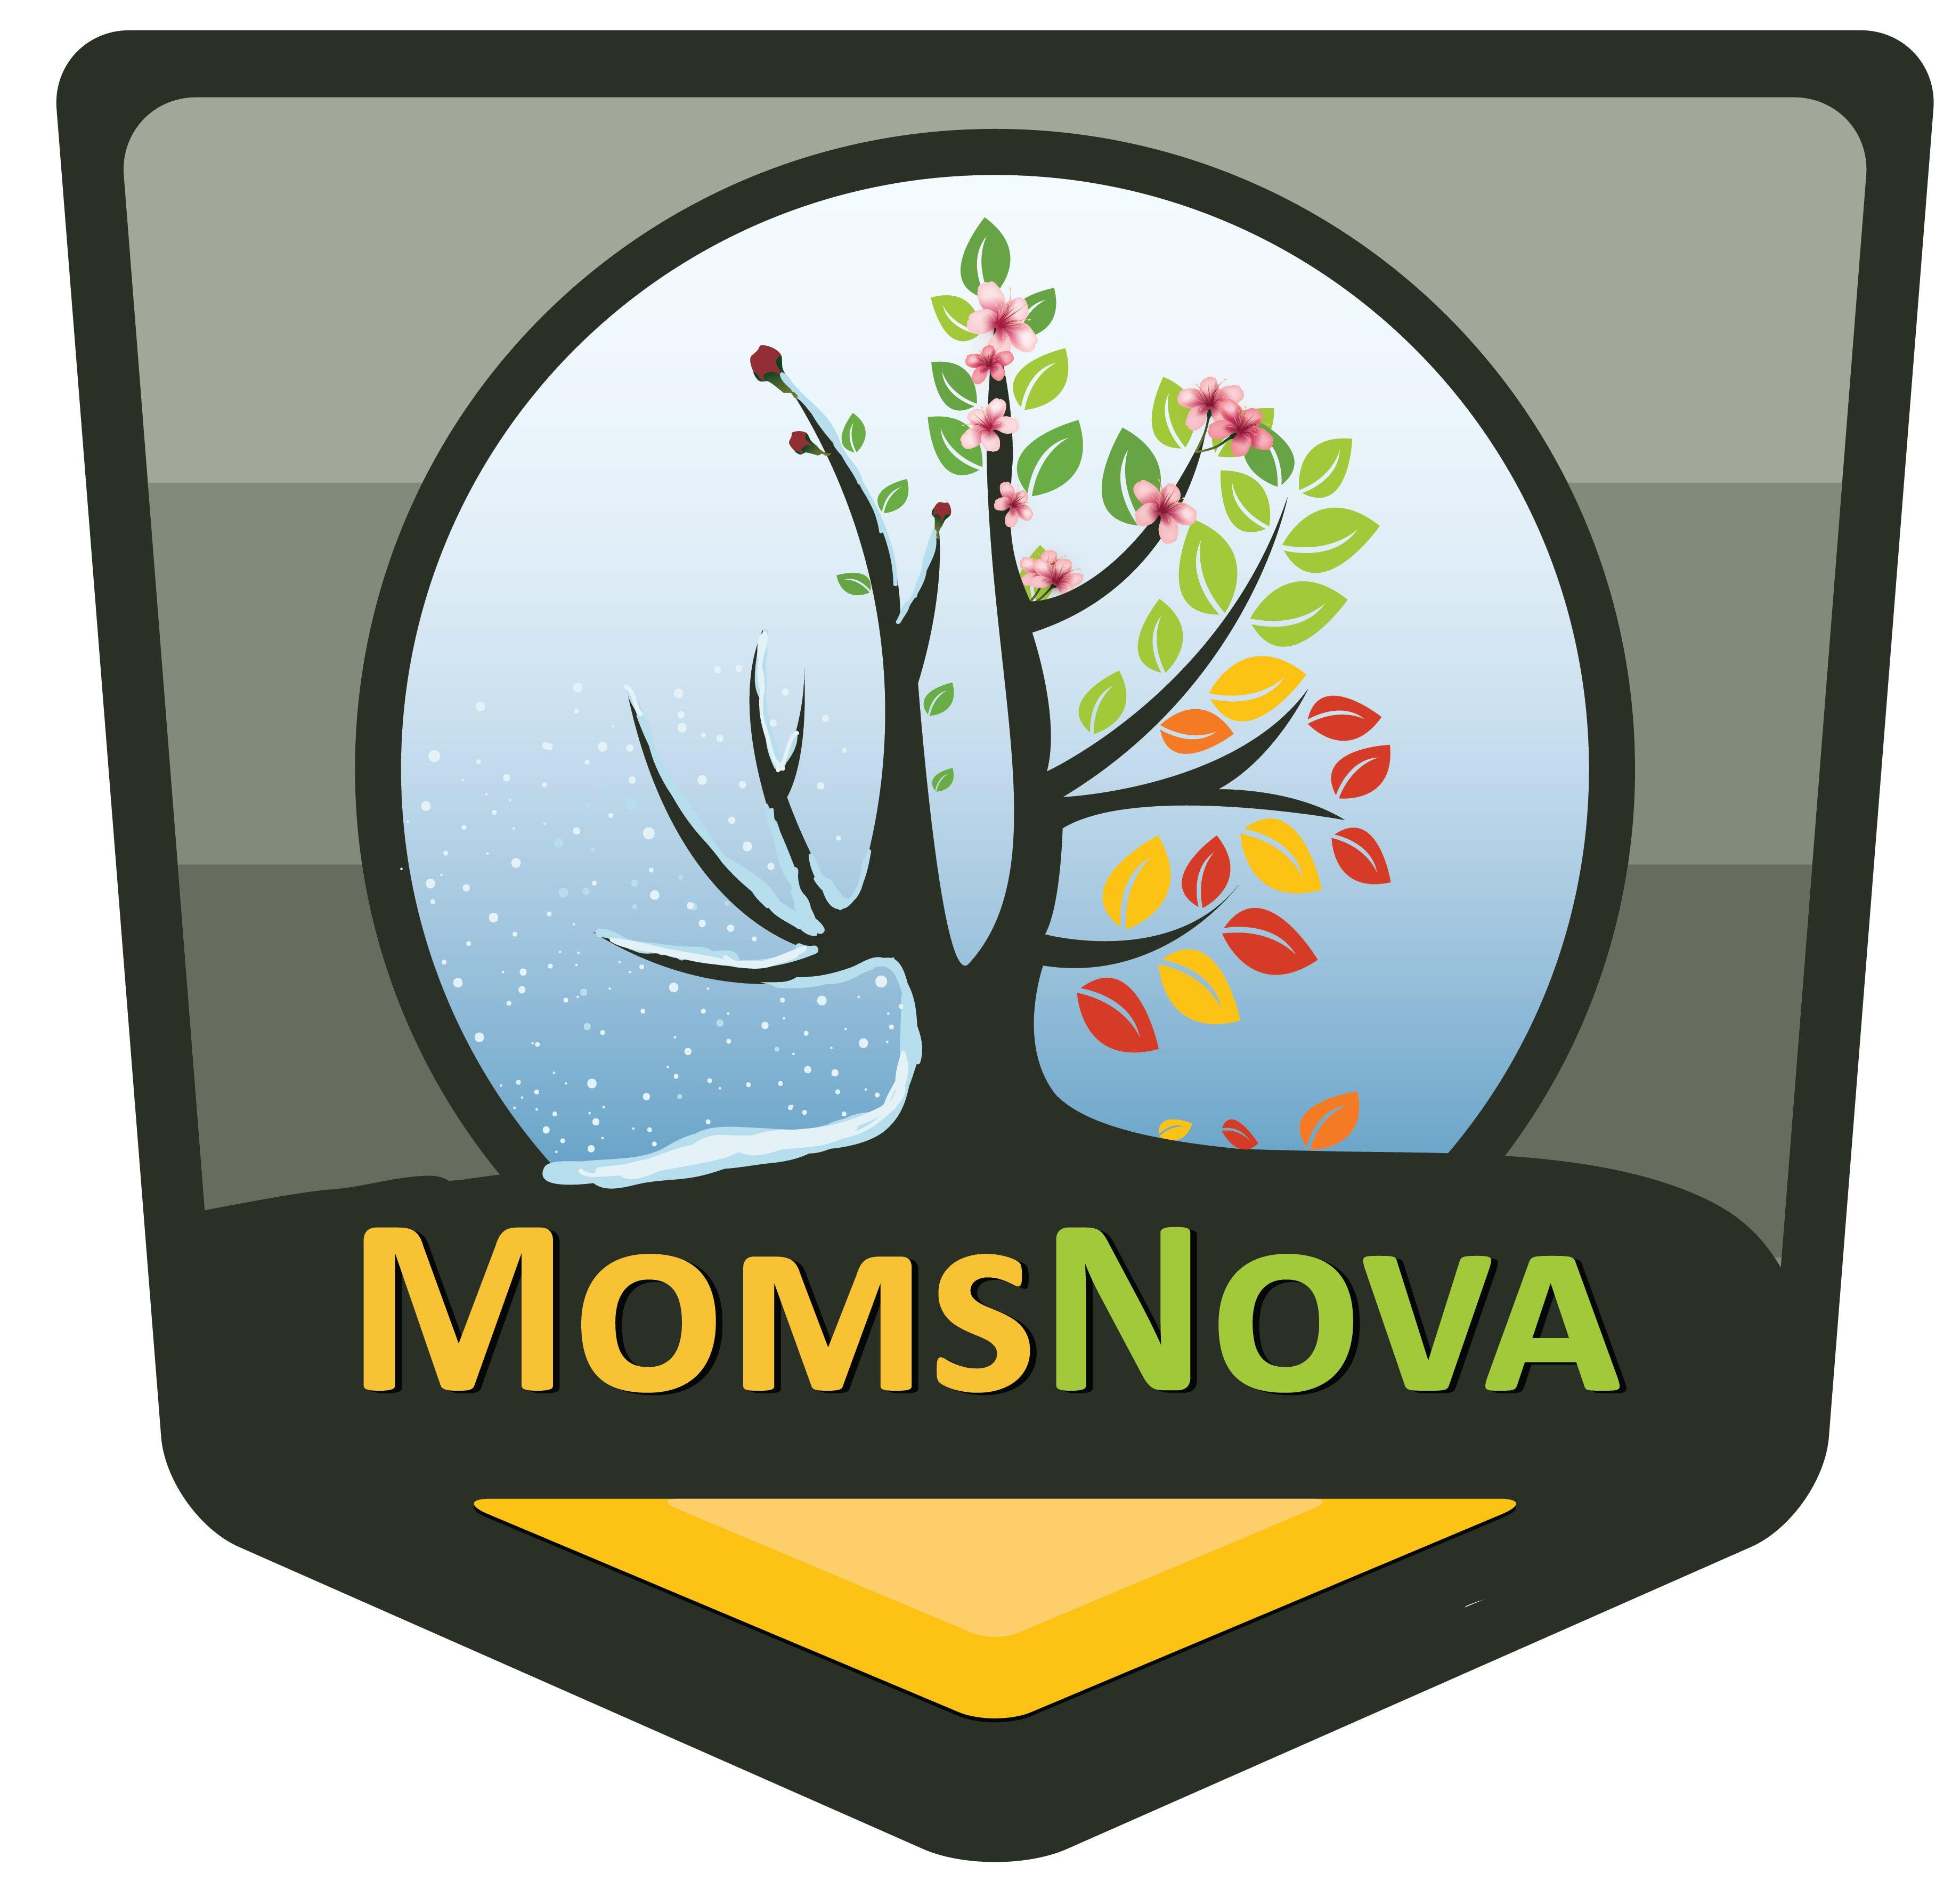 Moms NoVa